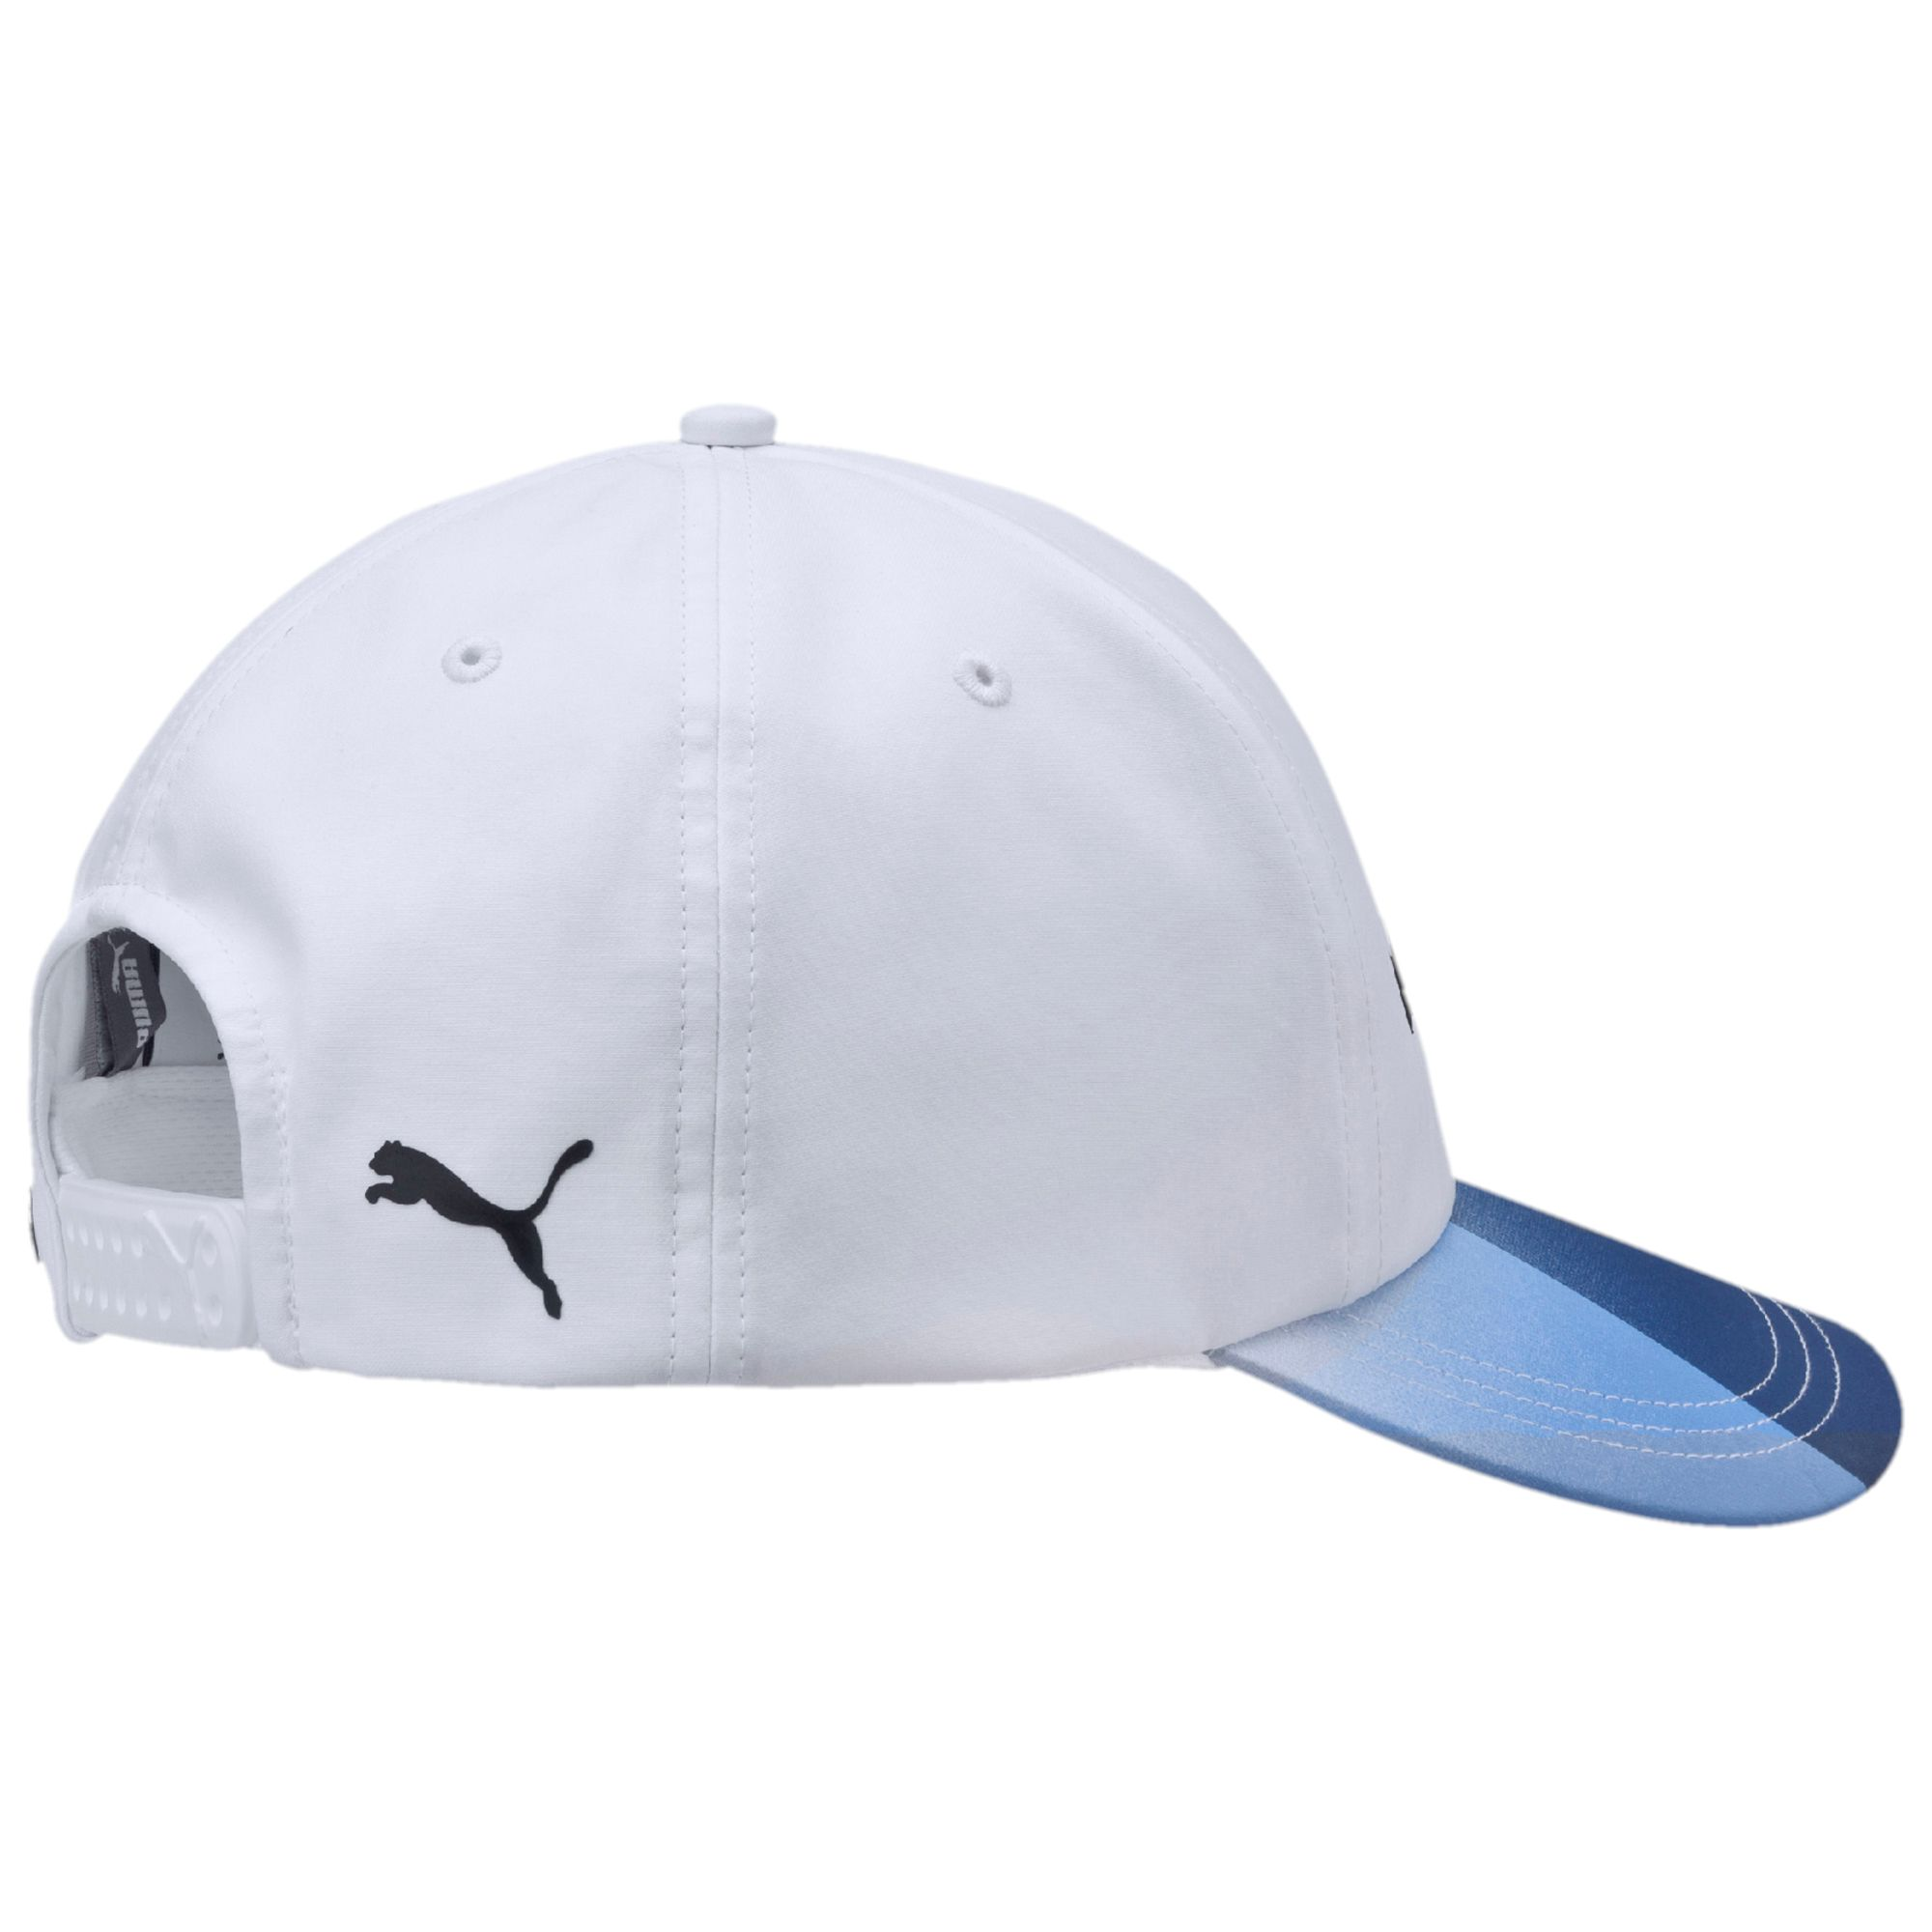 max genuine s performance men adidas bmw navy cap